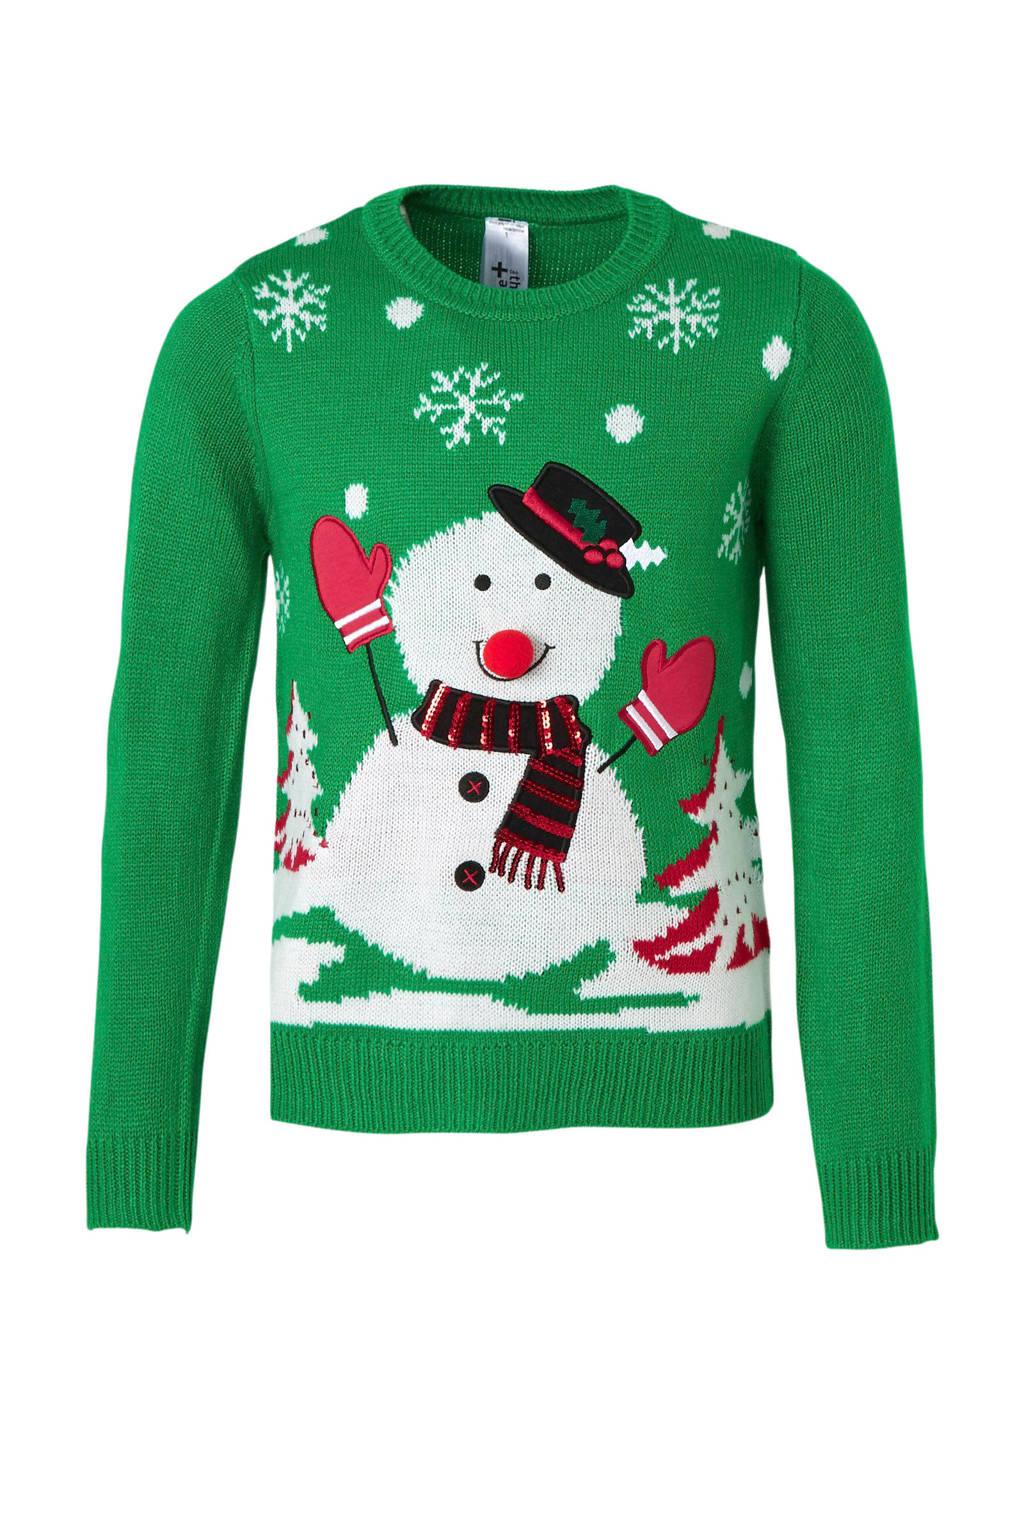 C&A Here & There gebreide kersttrui met printopdruk en pailletten groen/wit/rood, Groen/Wit/Rood